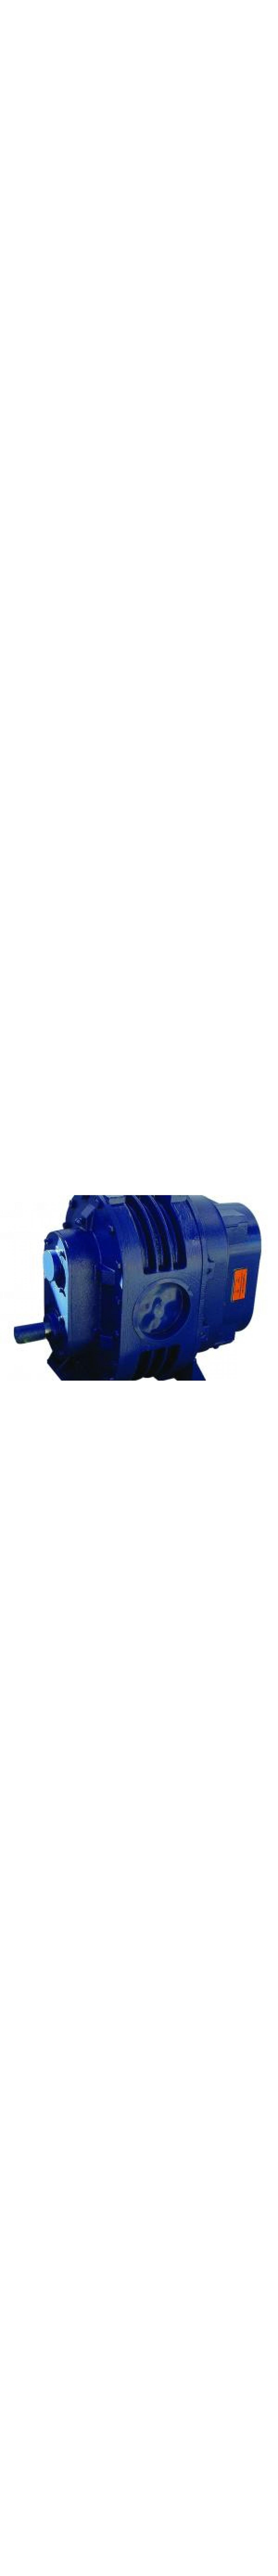 Blower Vacuum Pump